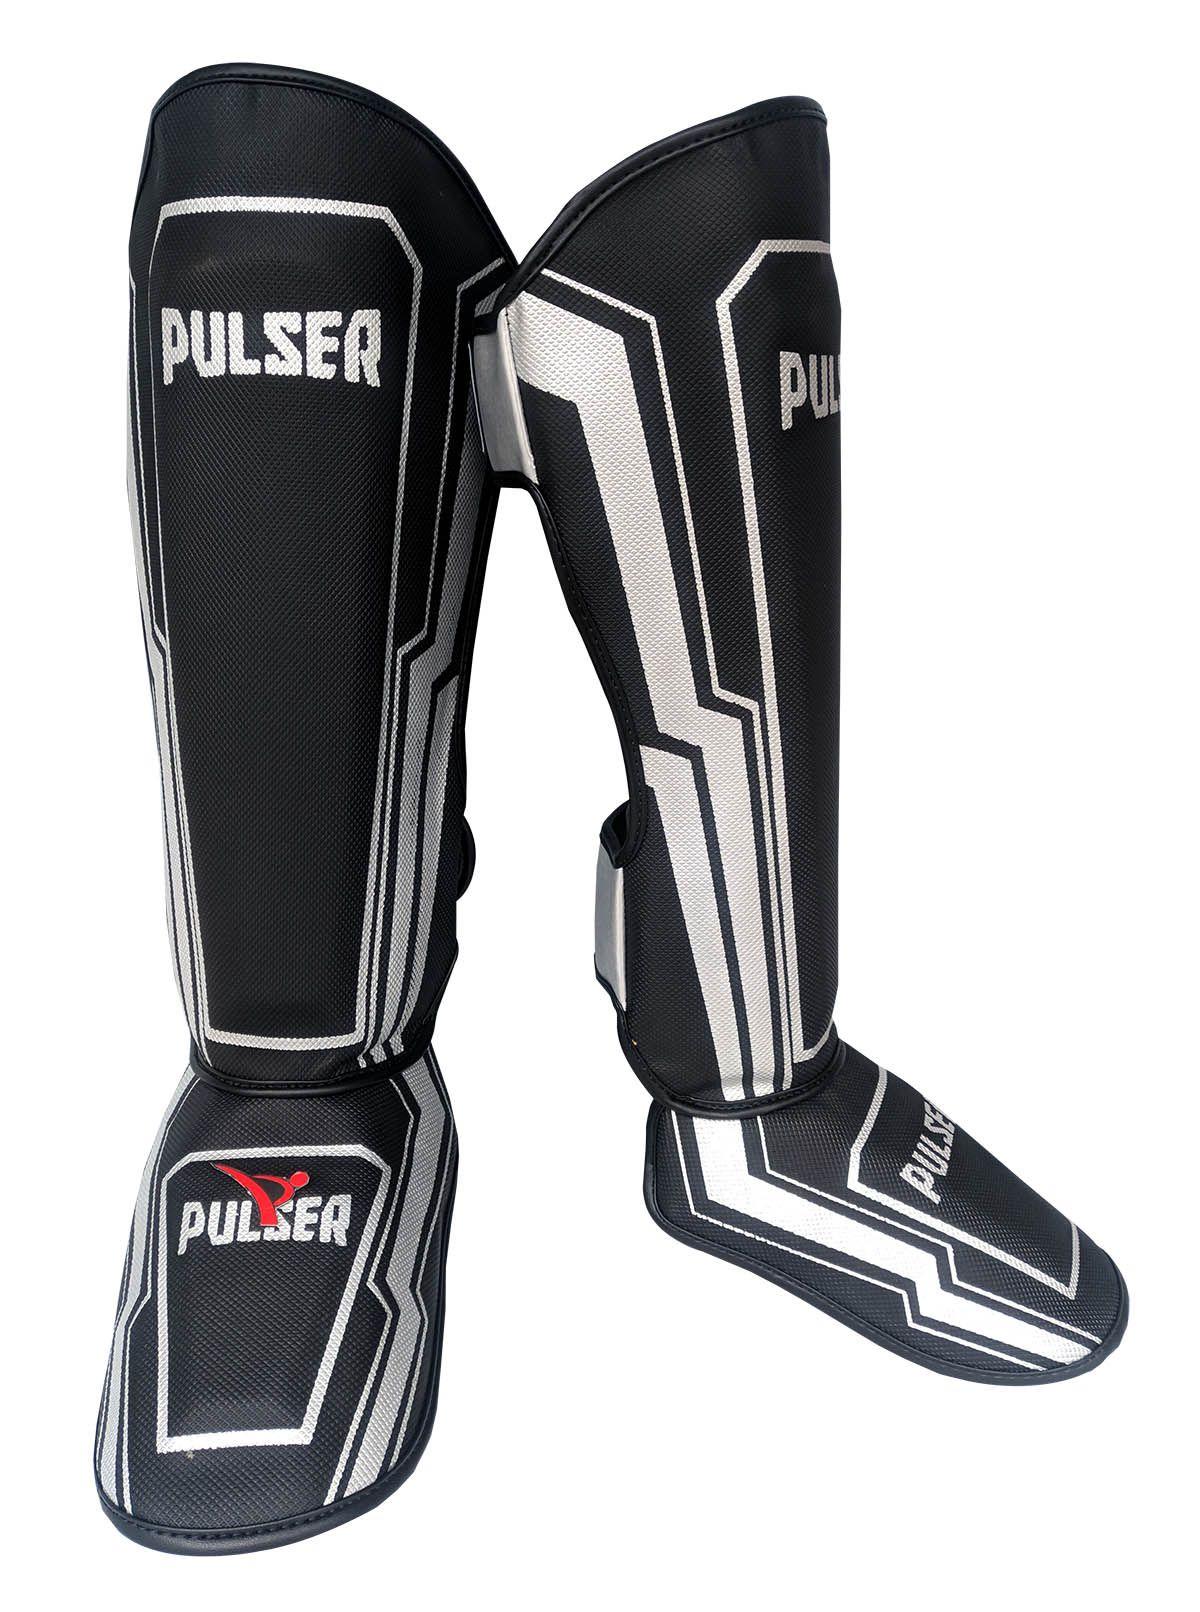 Caneleira Muay Thai MMA Preto Iron Grande 30mm - Pulser  - PRALUTA SHOP